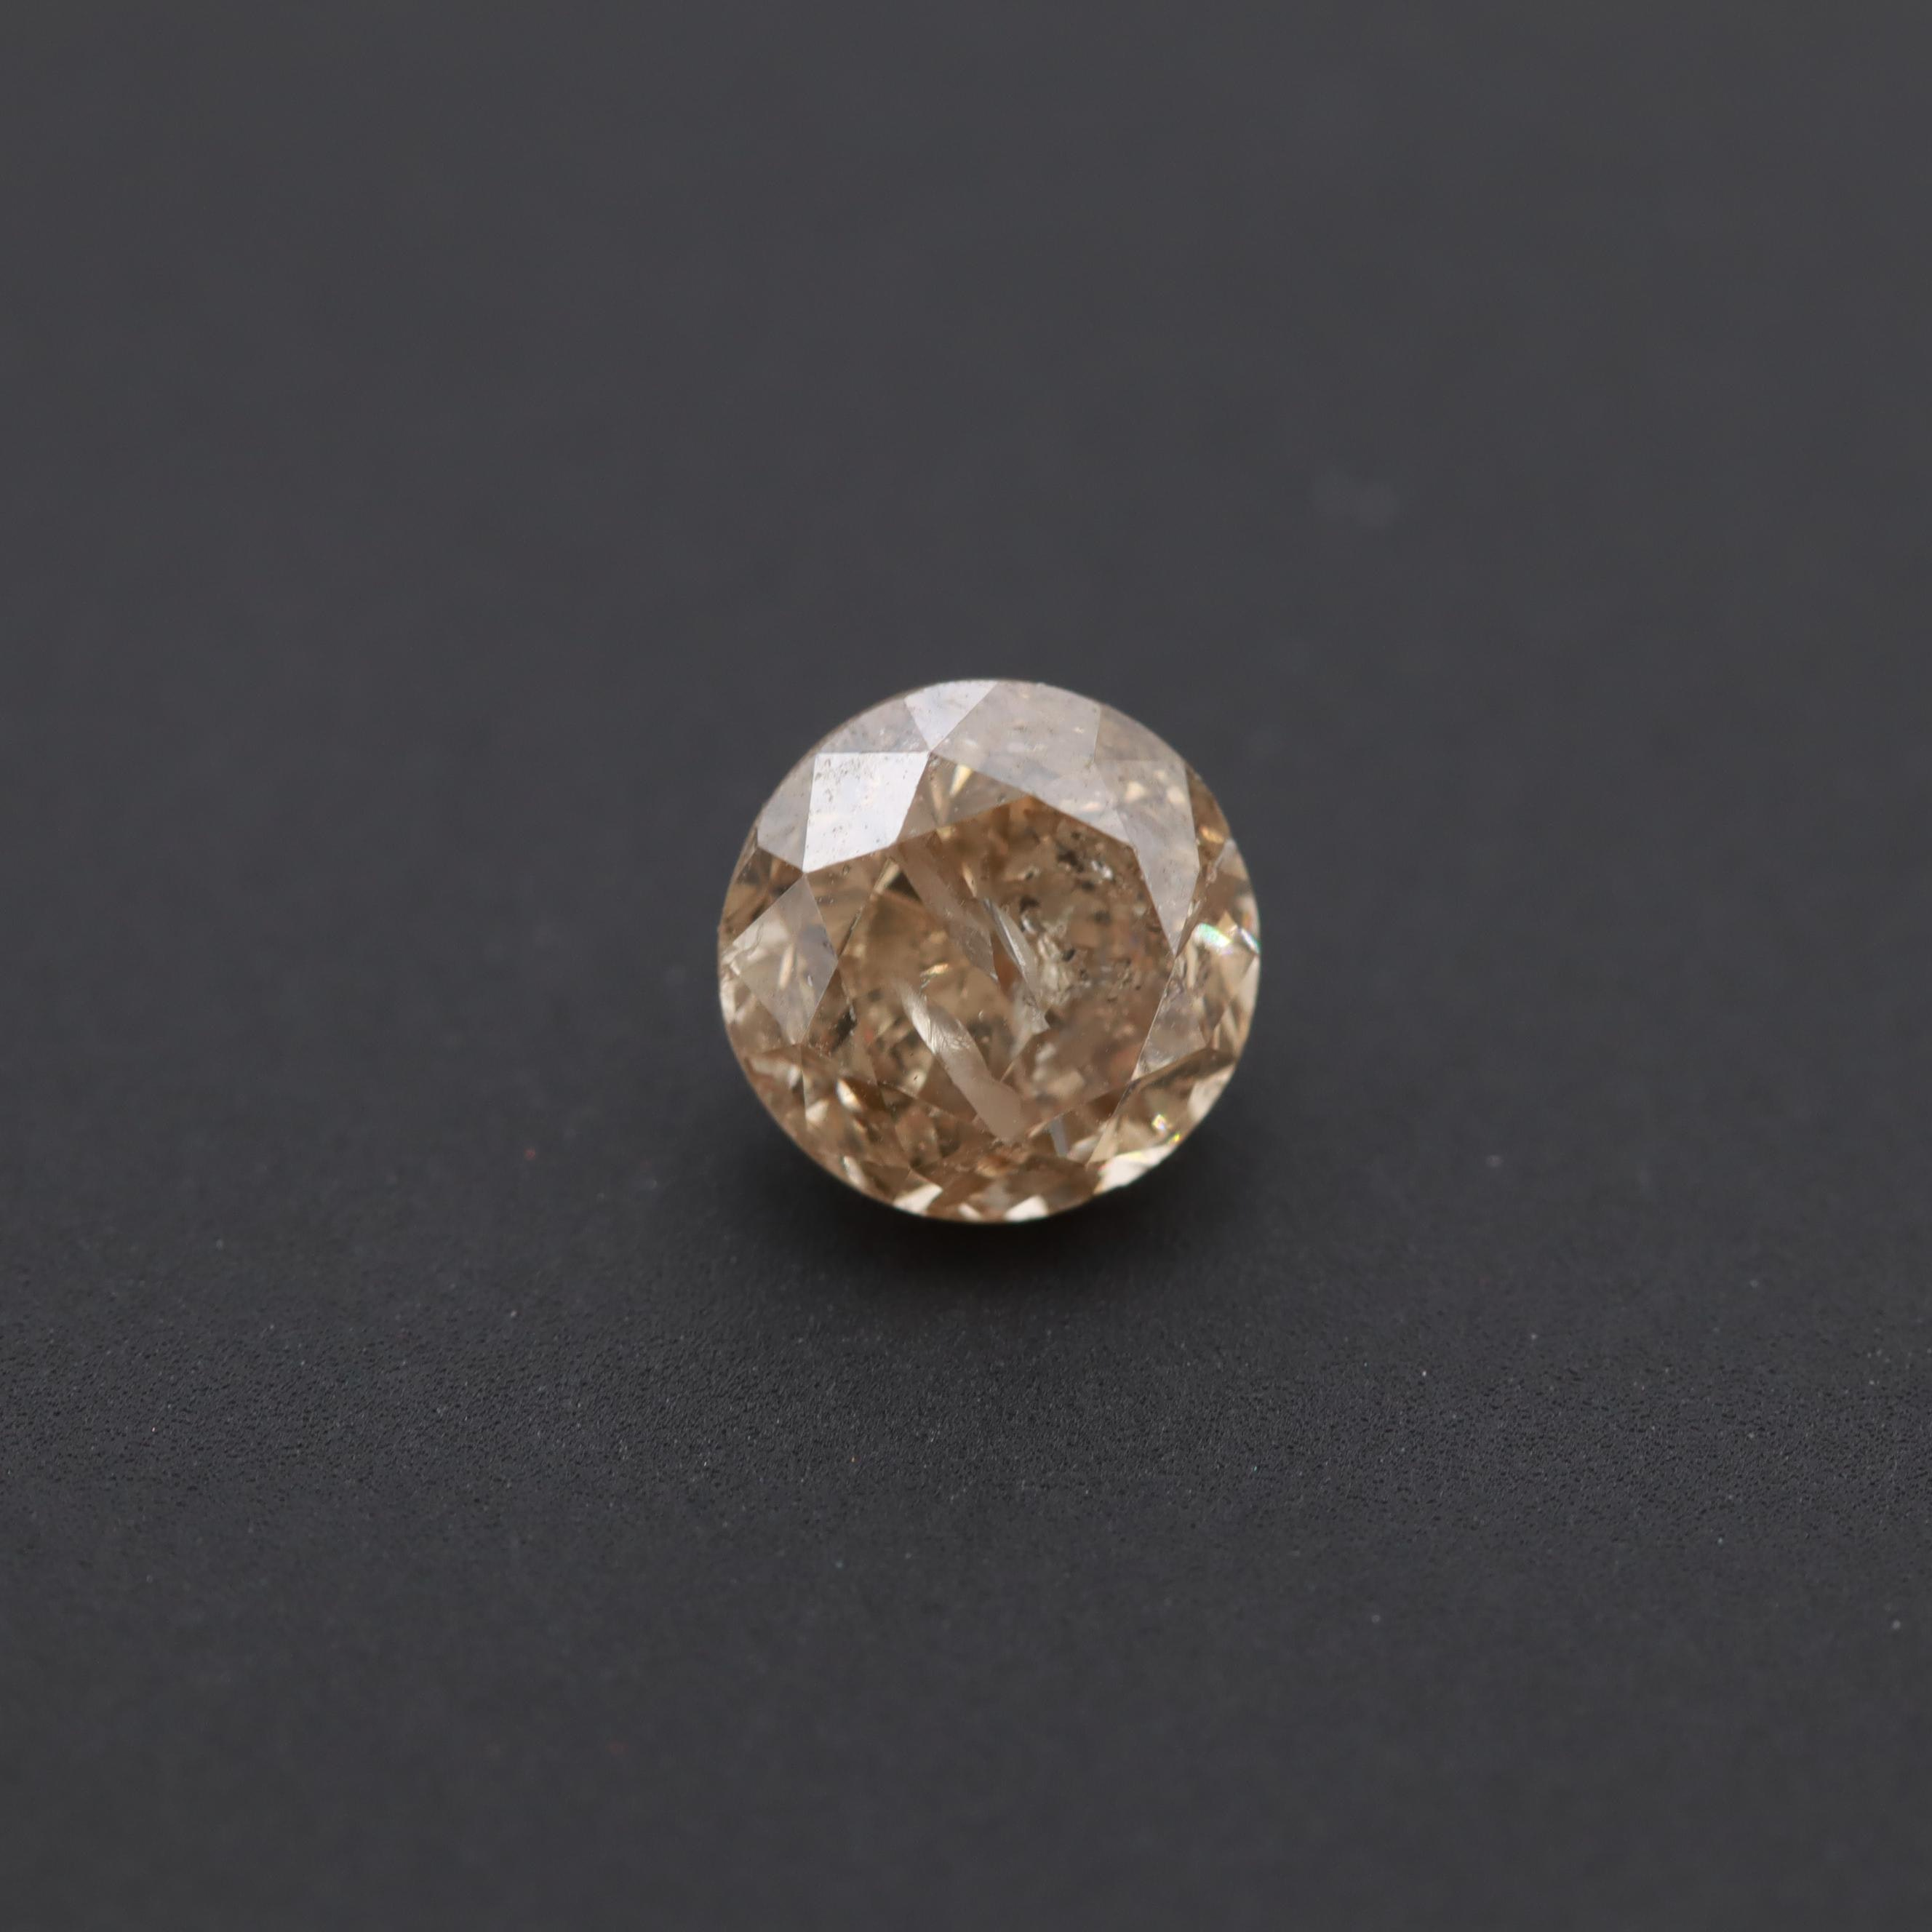 Loose 0.82 CT Fancy Color Diamond